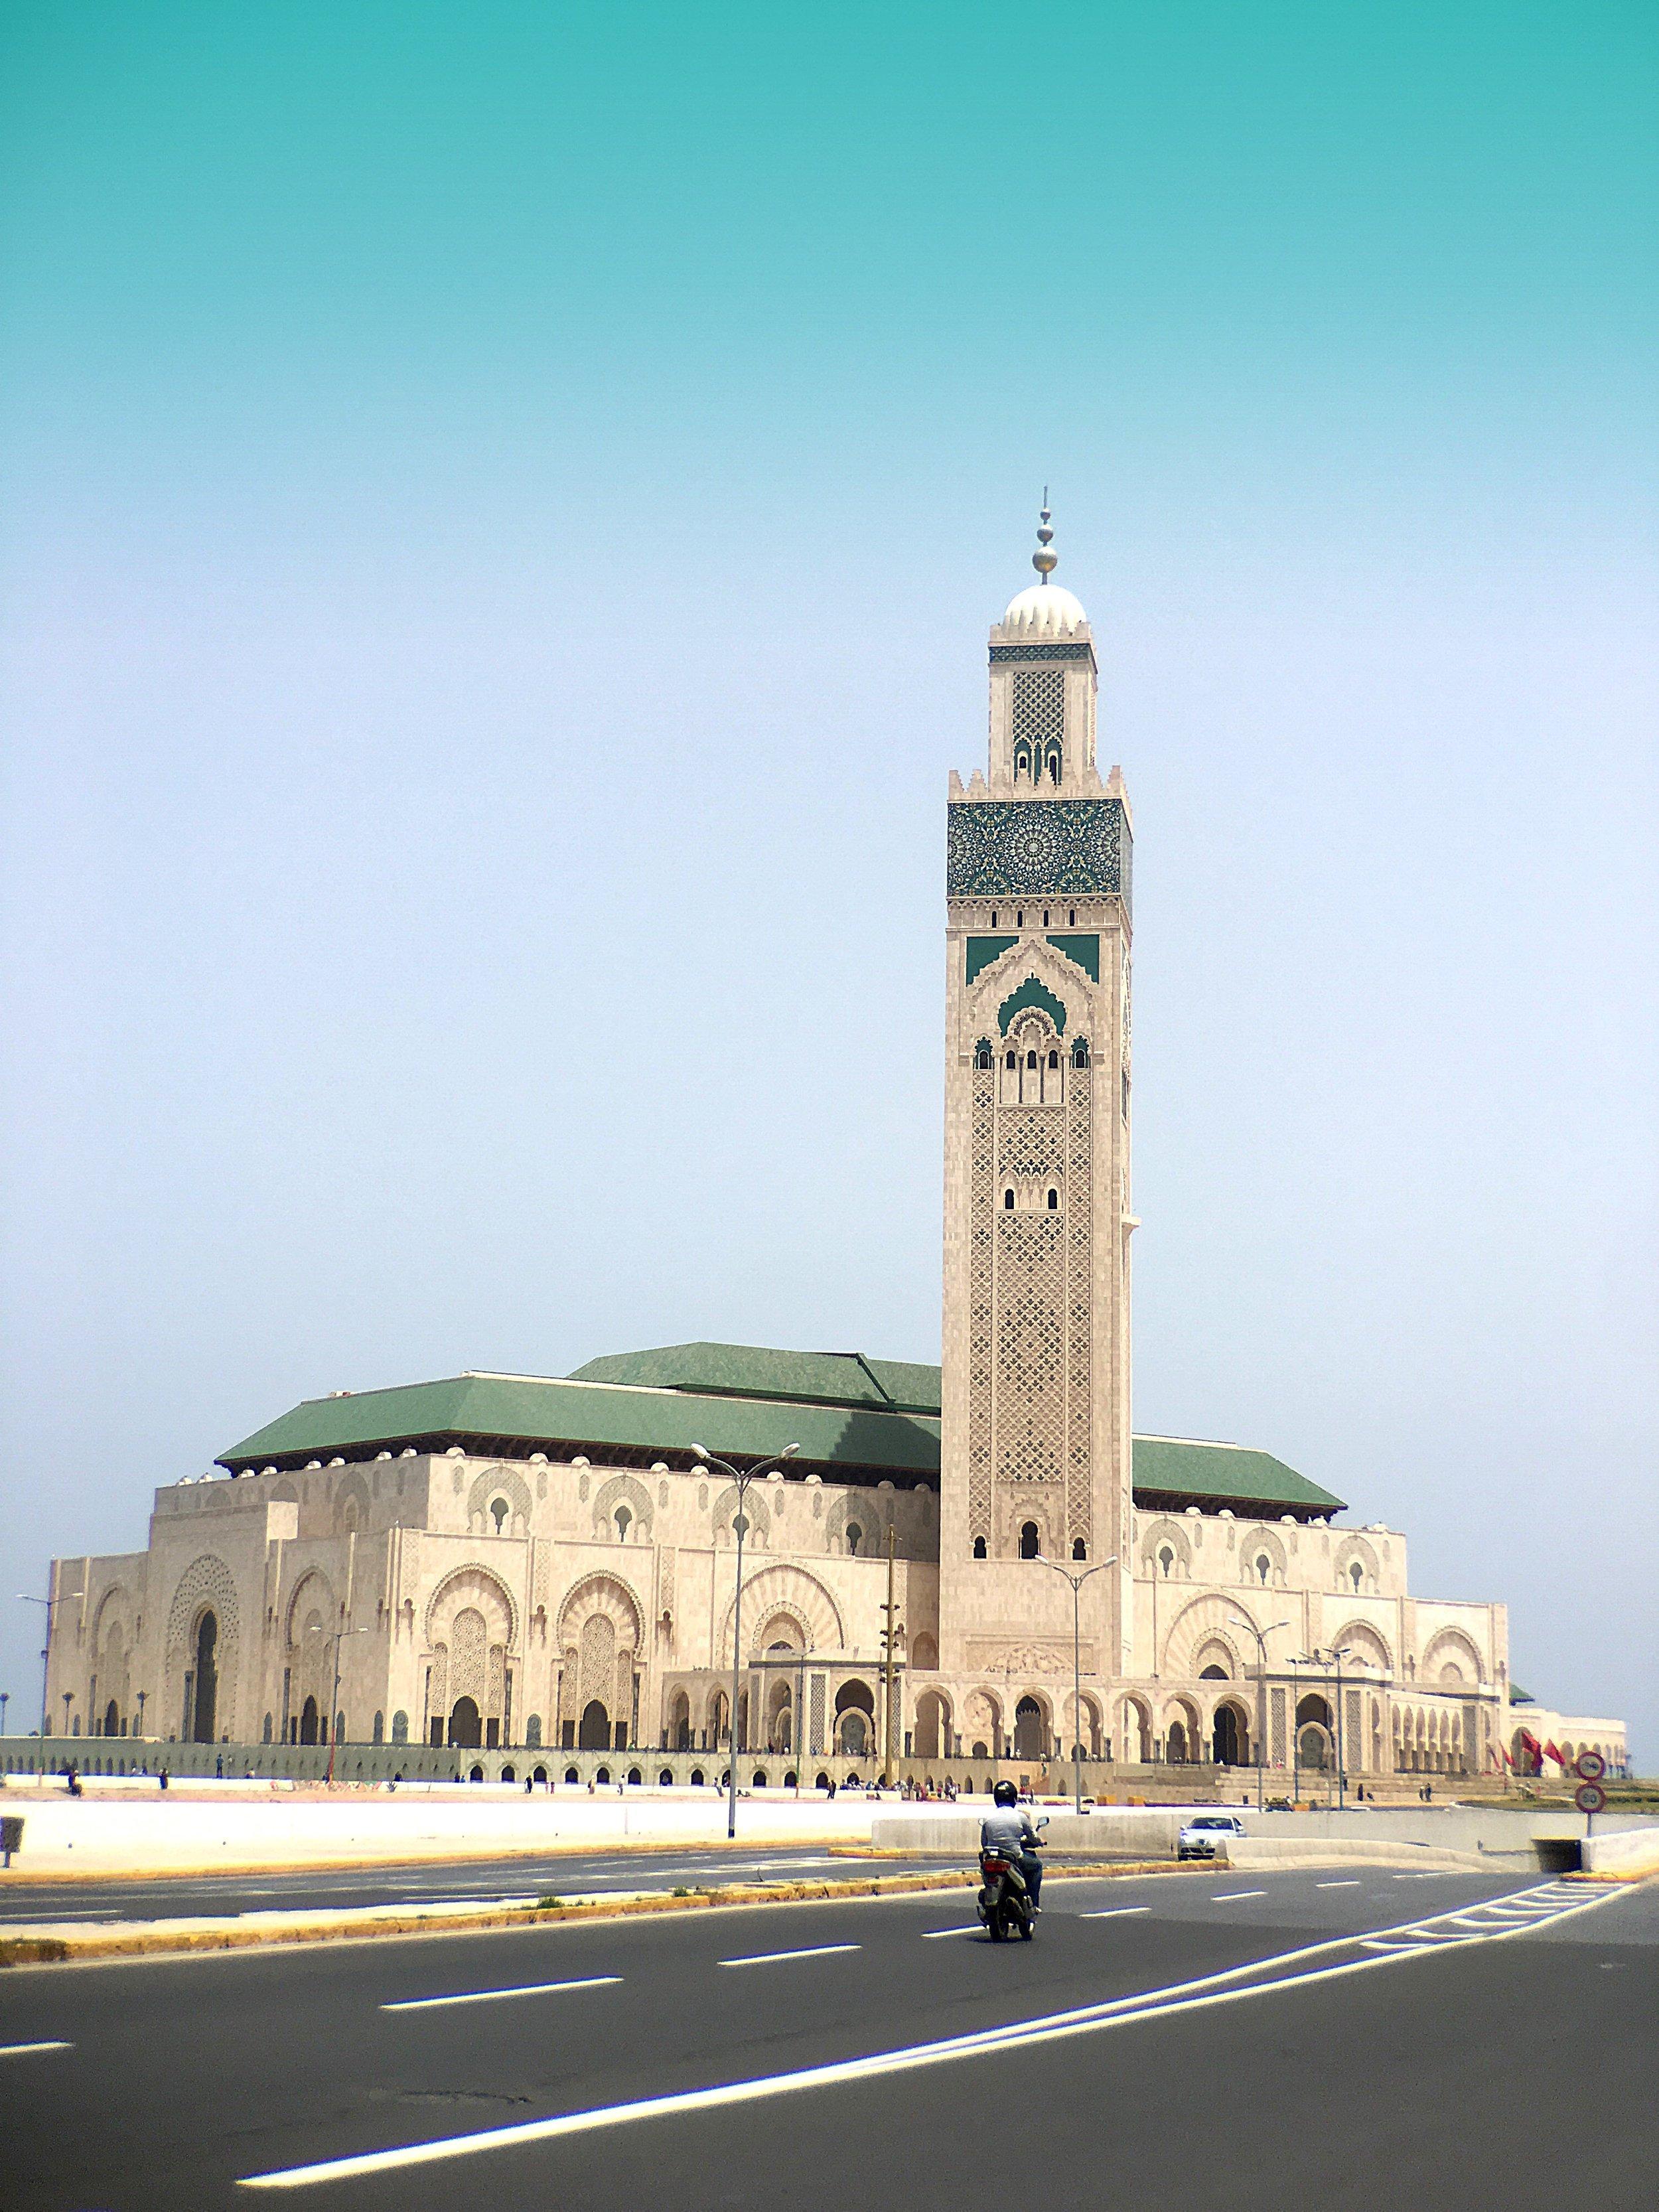 Grande Mosque de Rabat Médina, Morocco (Effect • Color Fog)